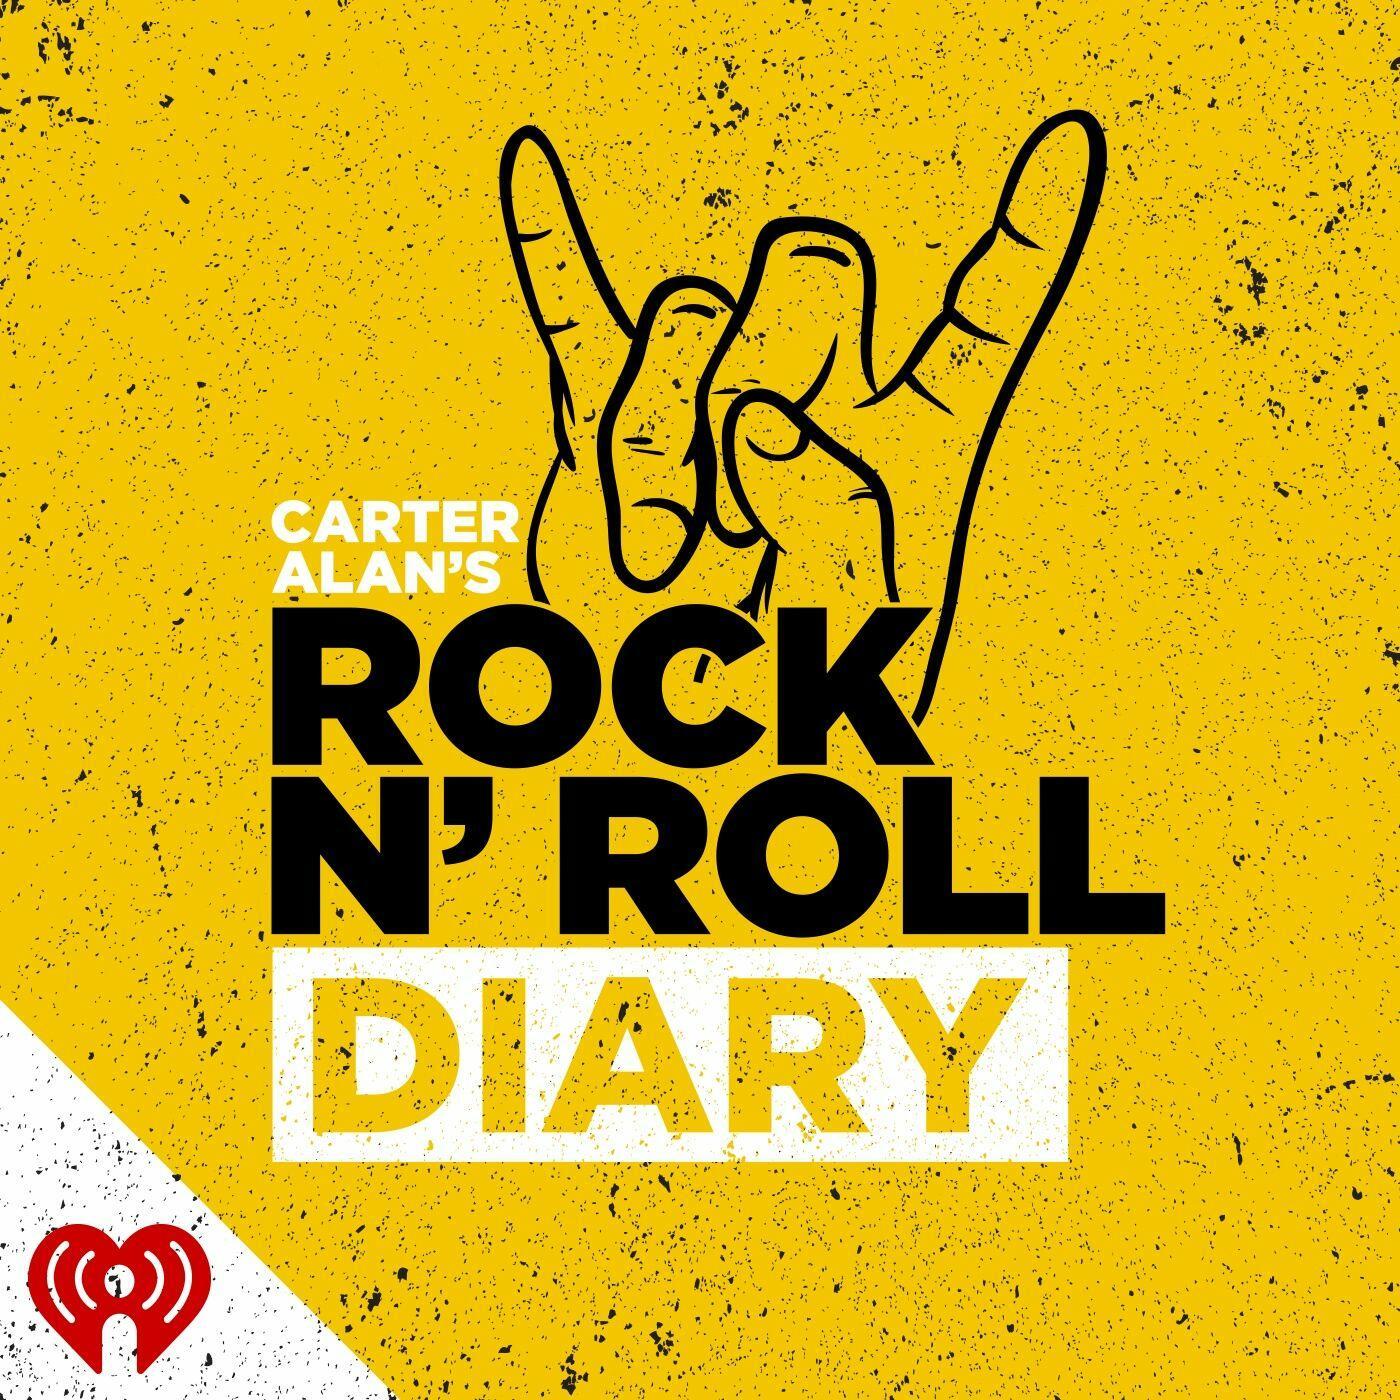 Carter Alan's Rock N' Roll Diary